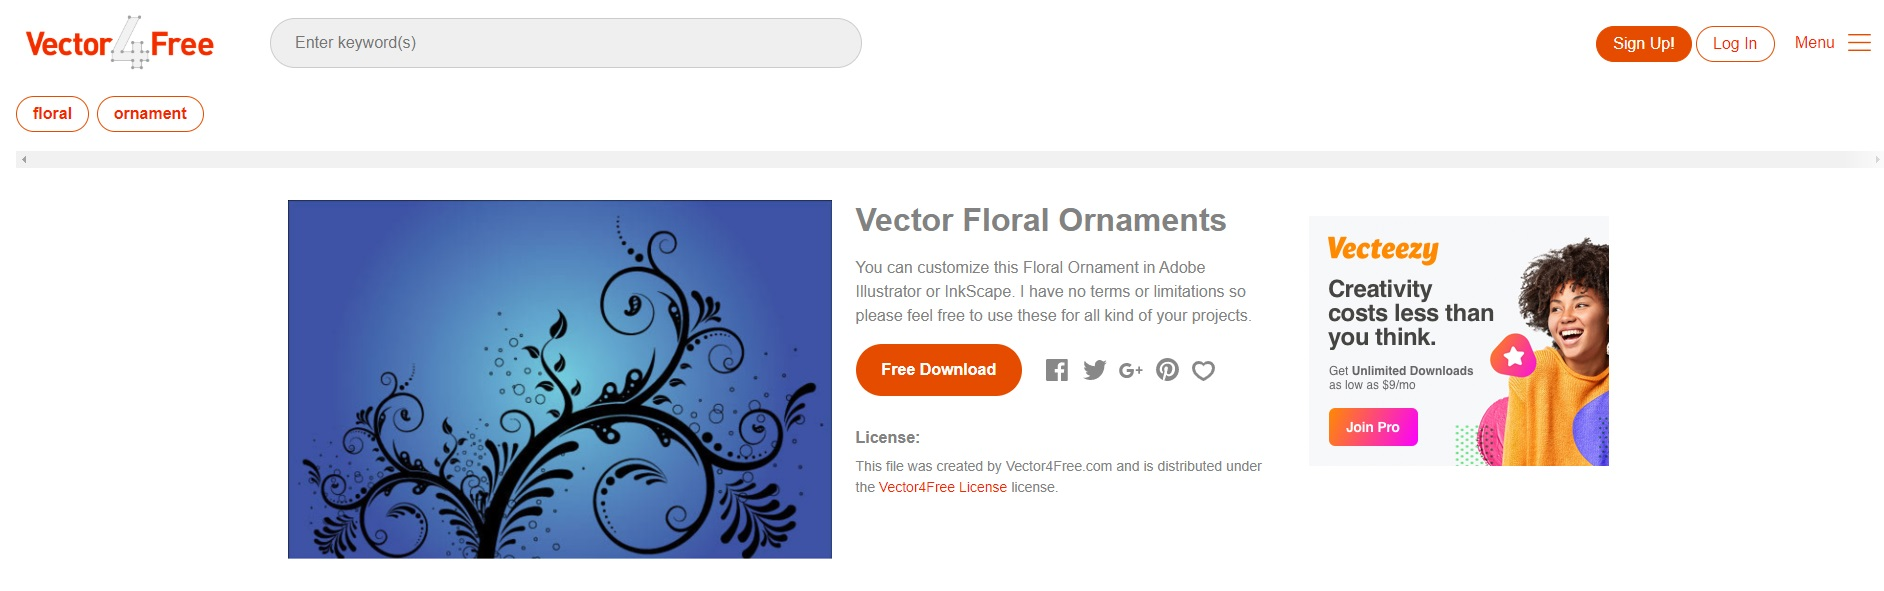 Vector4Free | 免費的網站向量素材下載